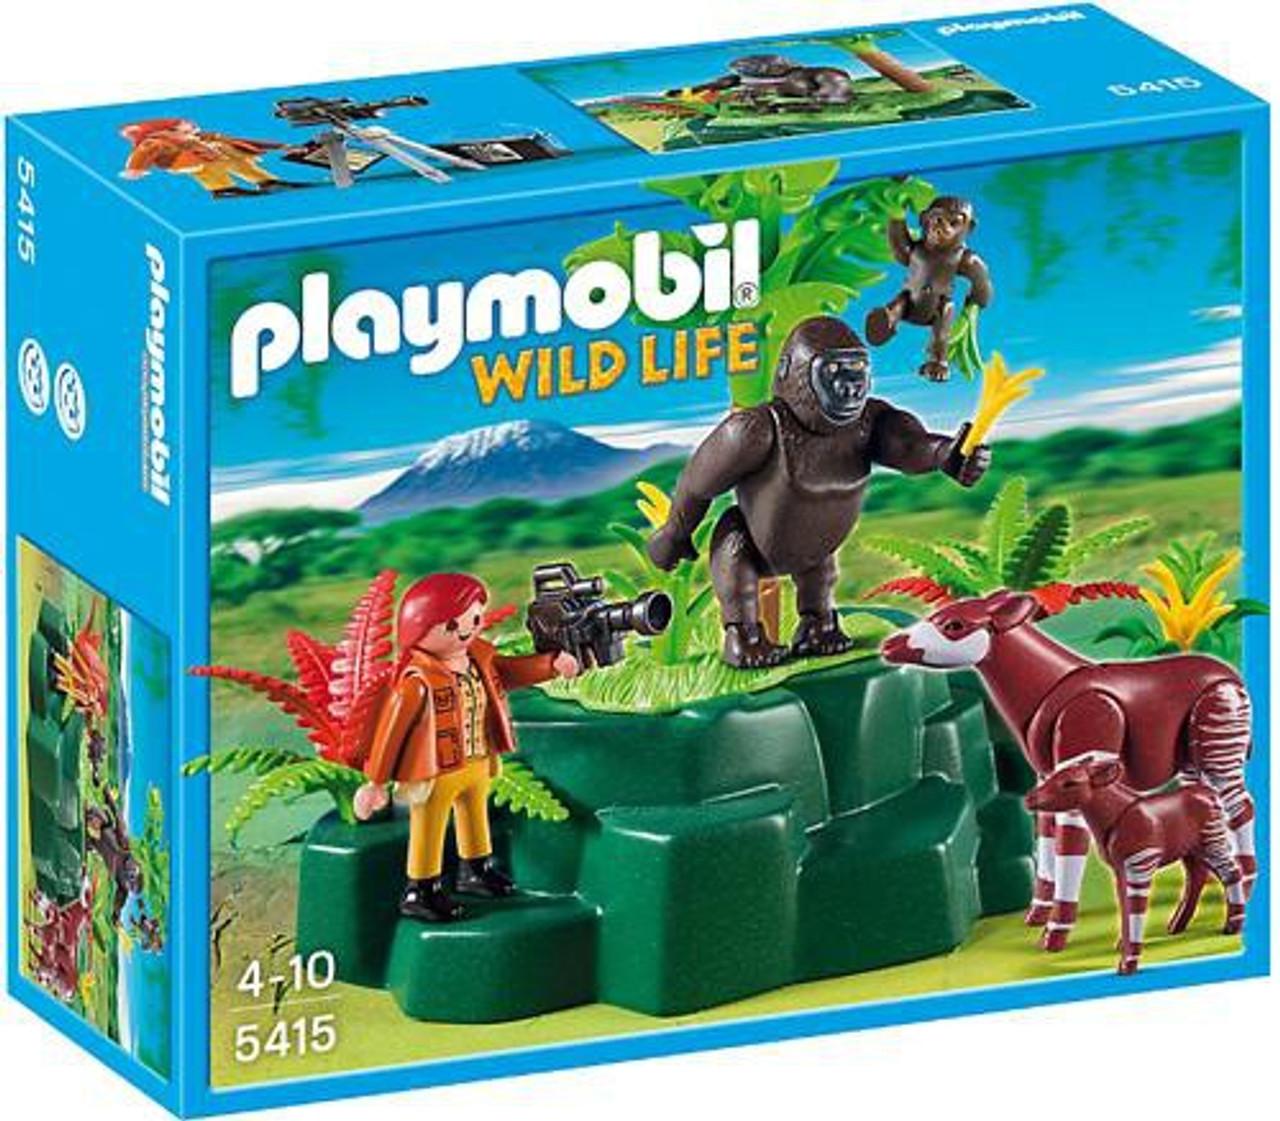 Playmobil Wild Life Gorillas & Okampis with Film Maker Set #5415